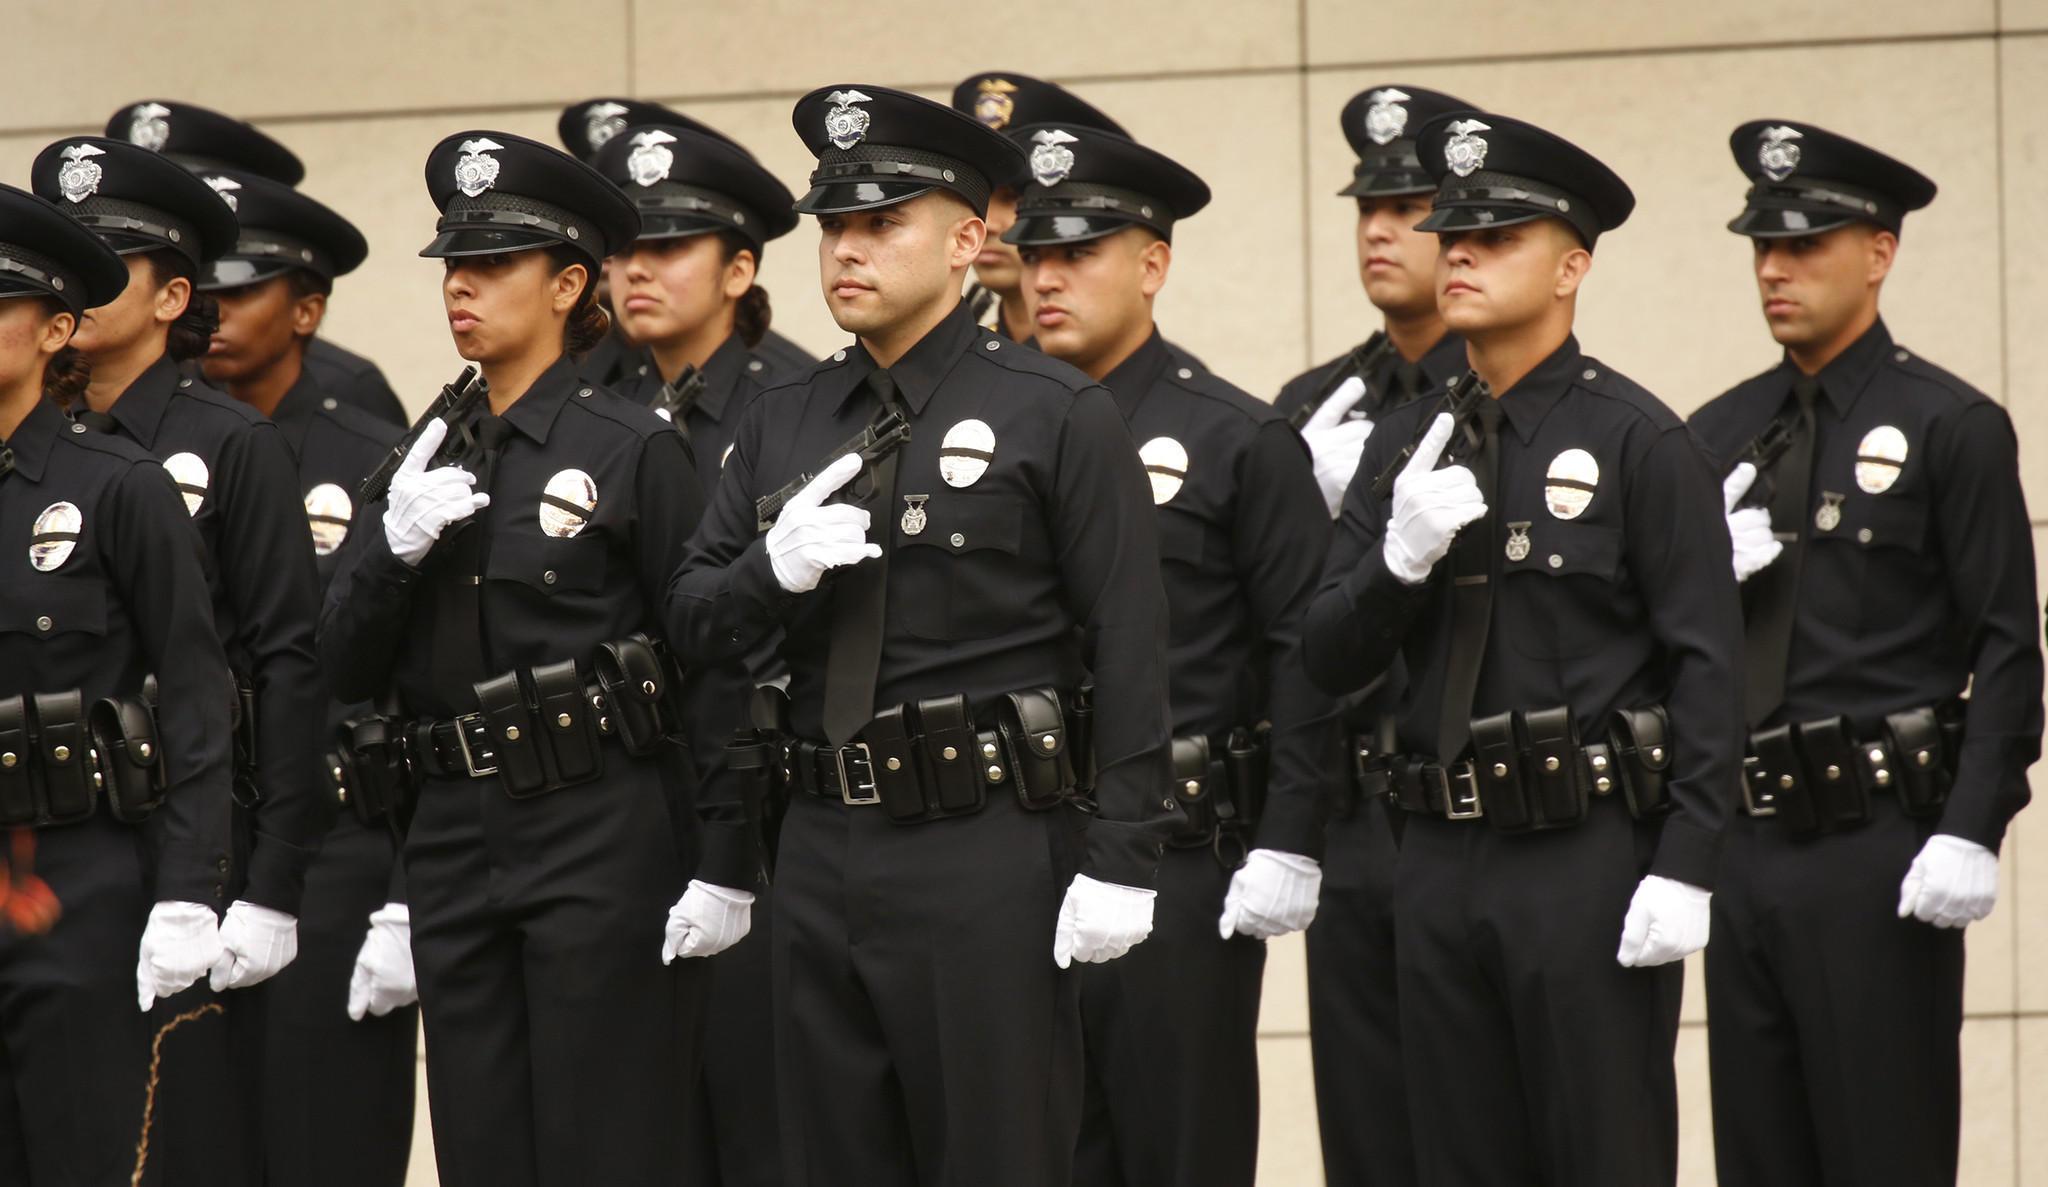 lapd police uniforms - photo #17